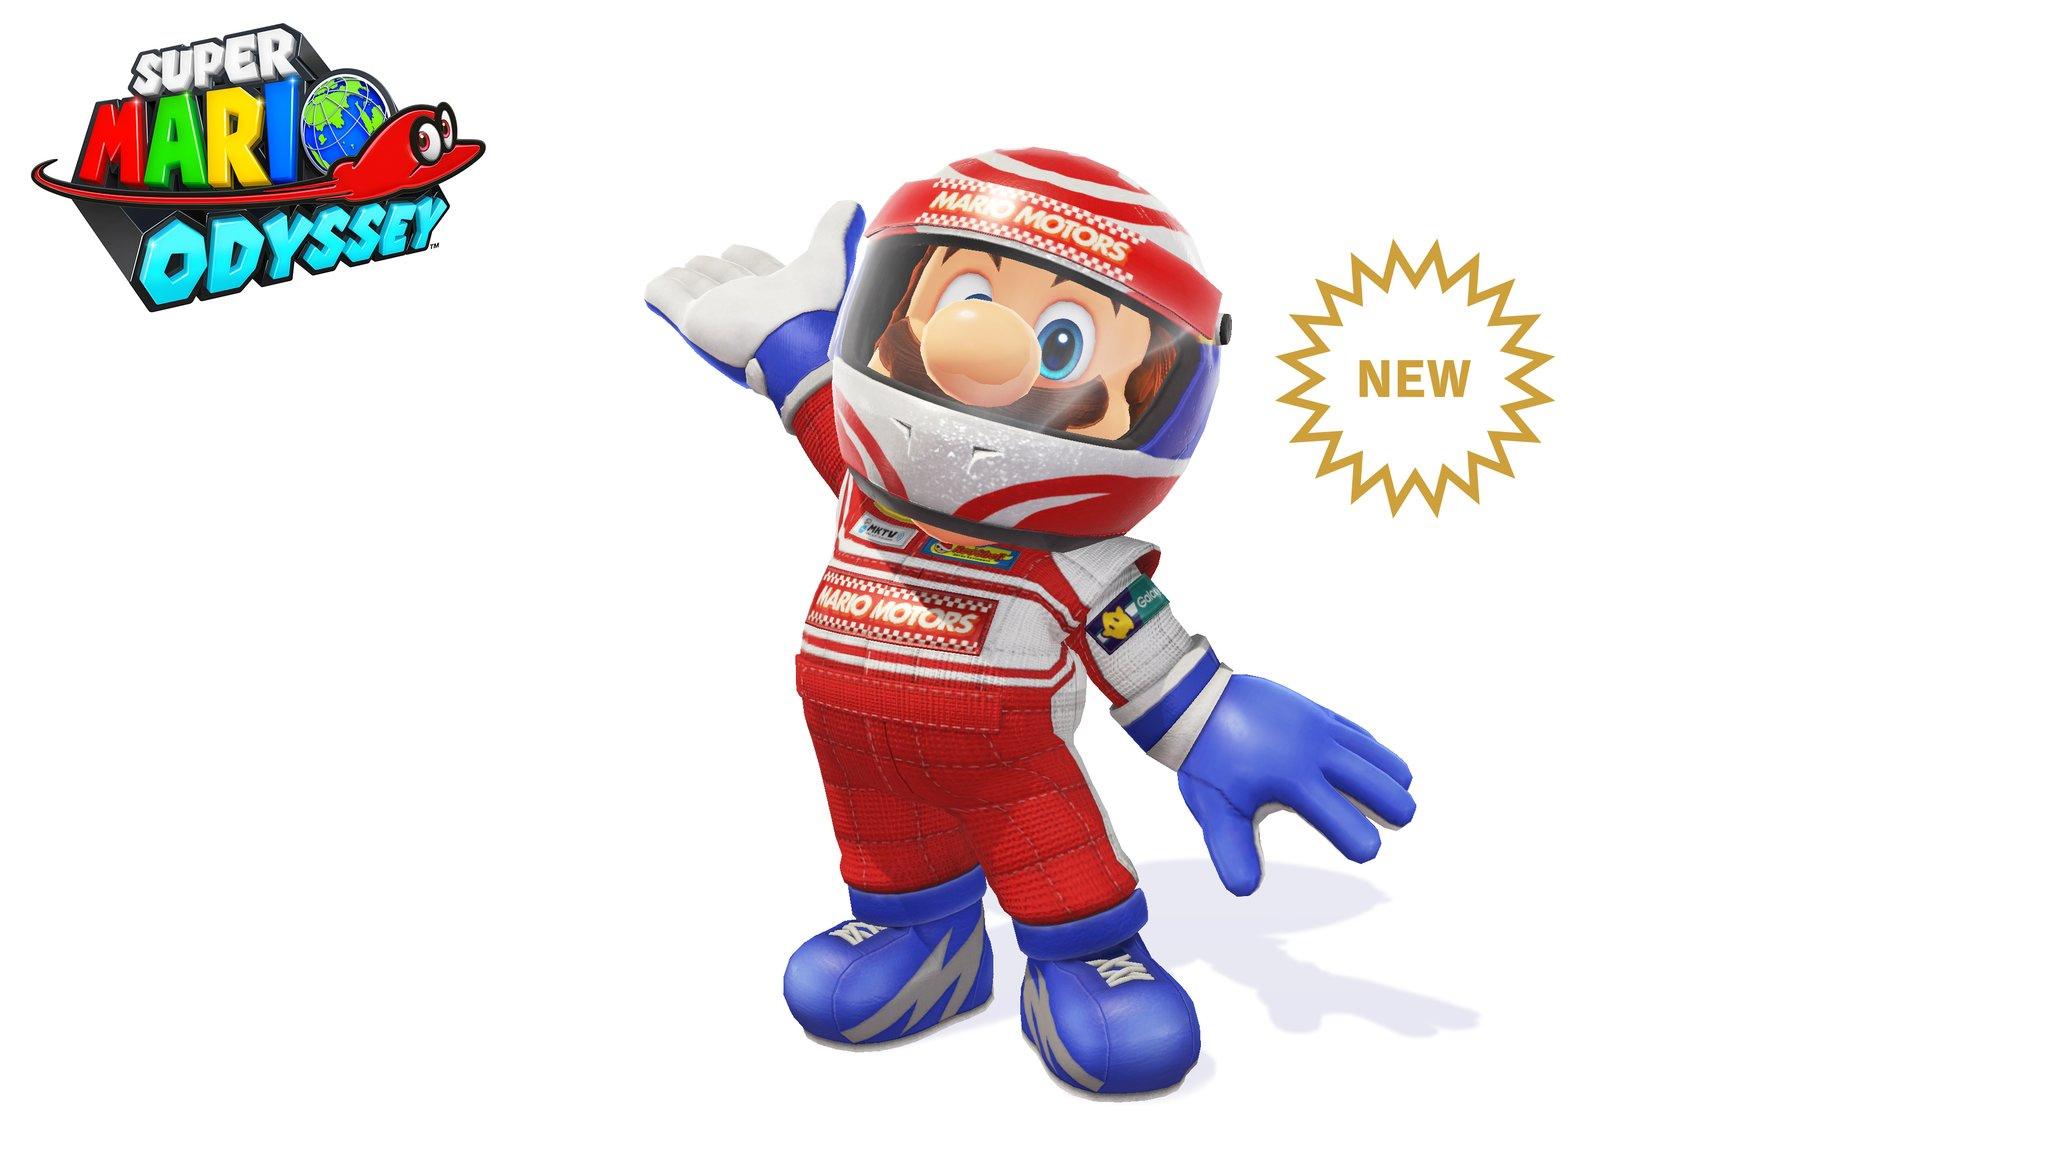 Mario has a sporty new look in Super Mario Odyssey screenshot